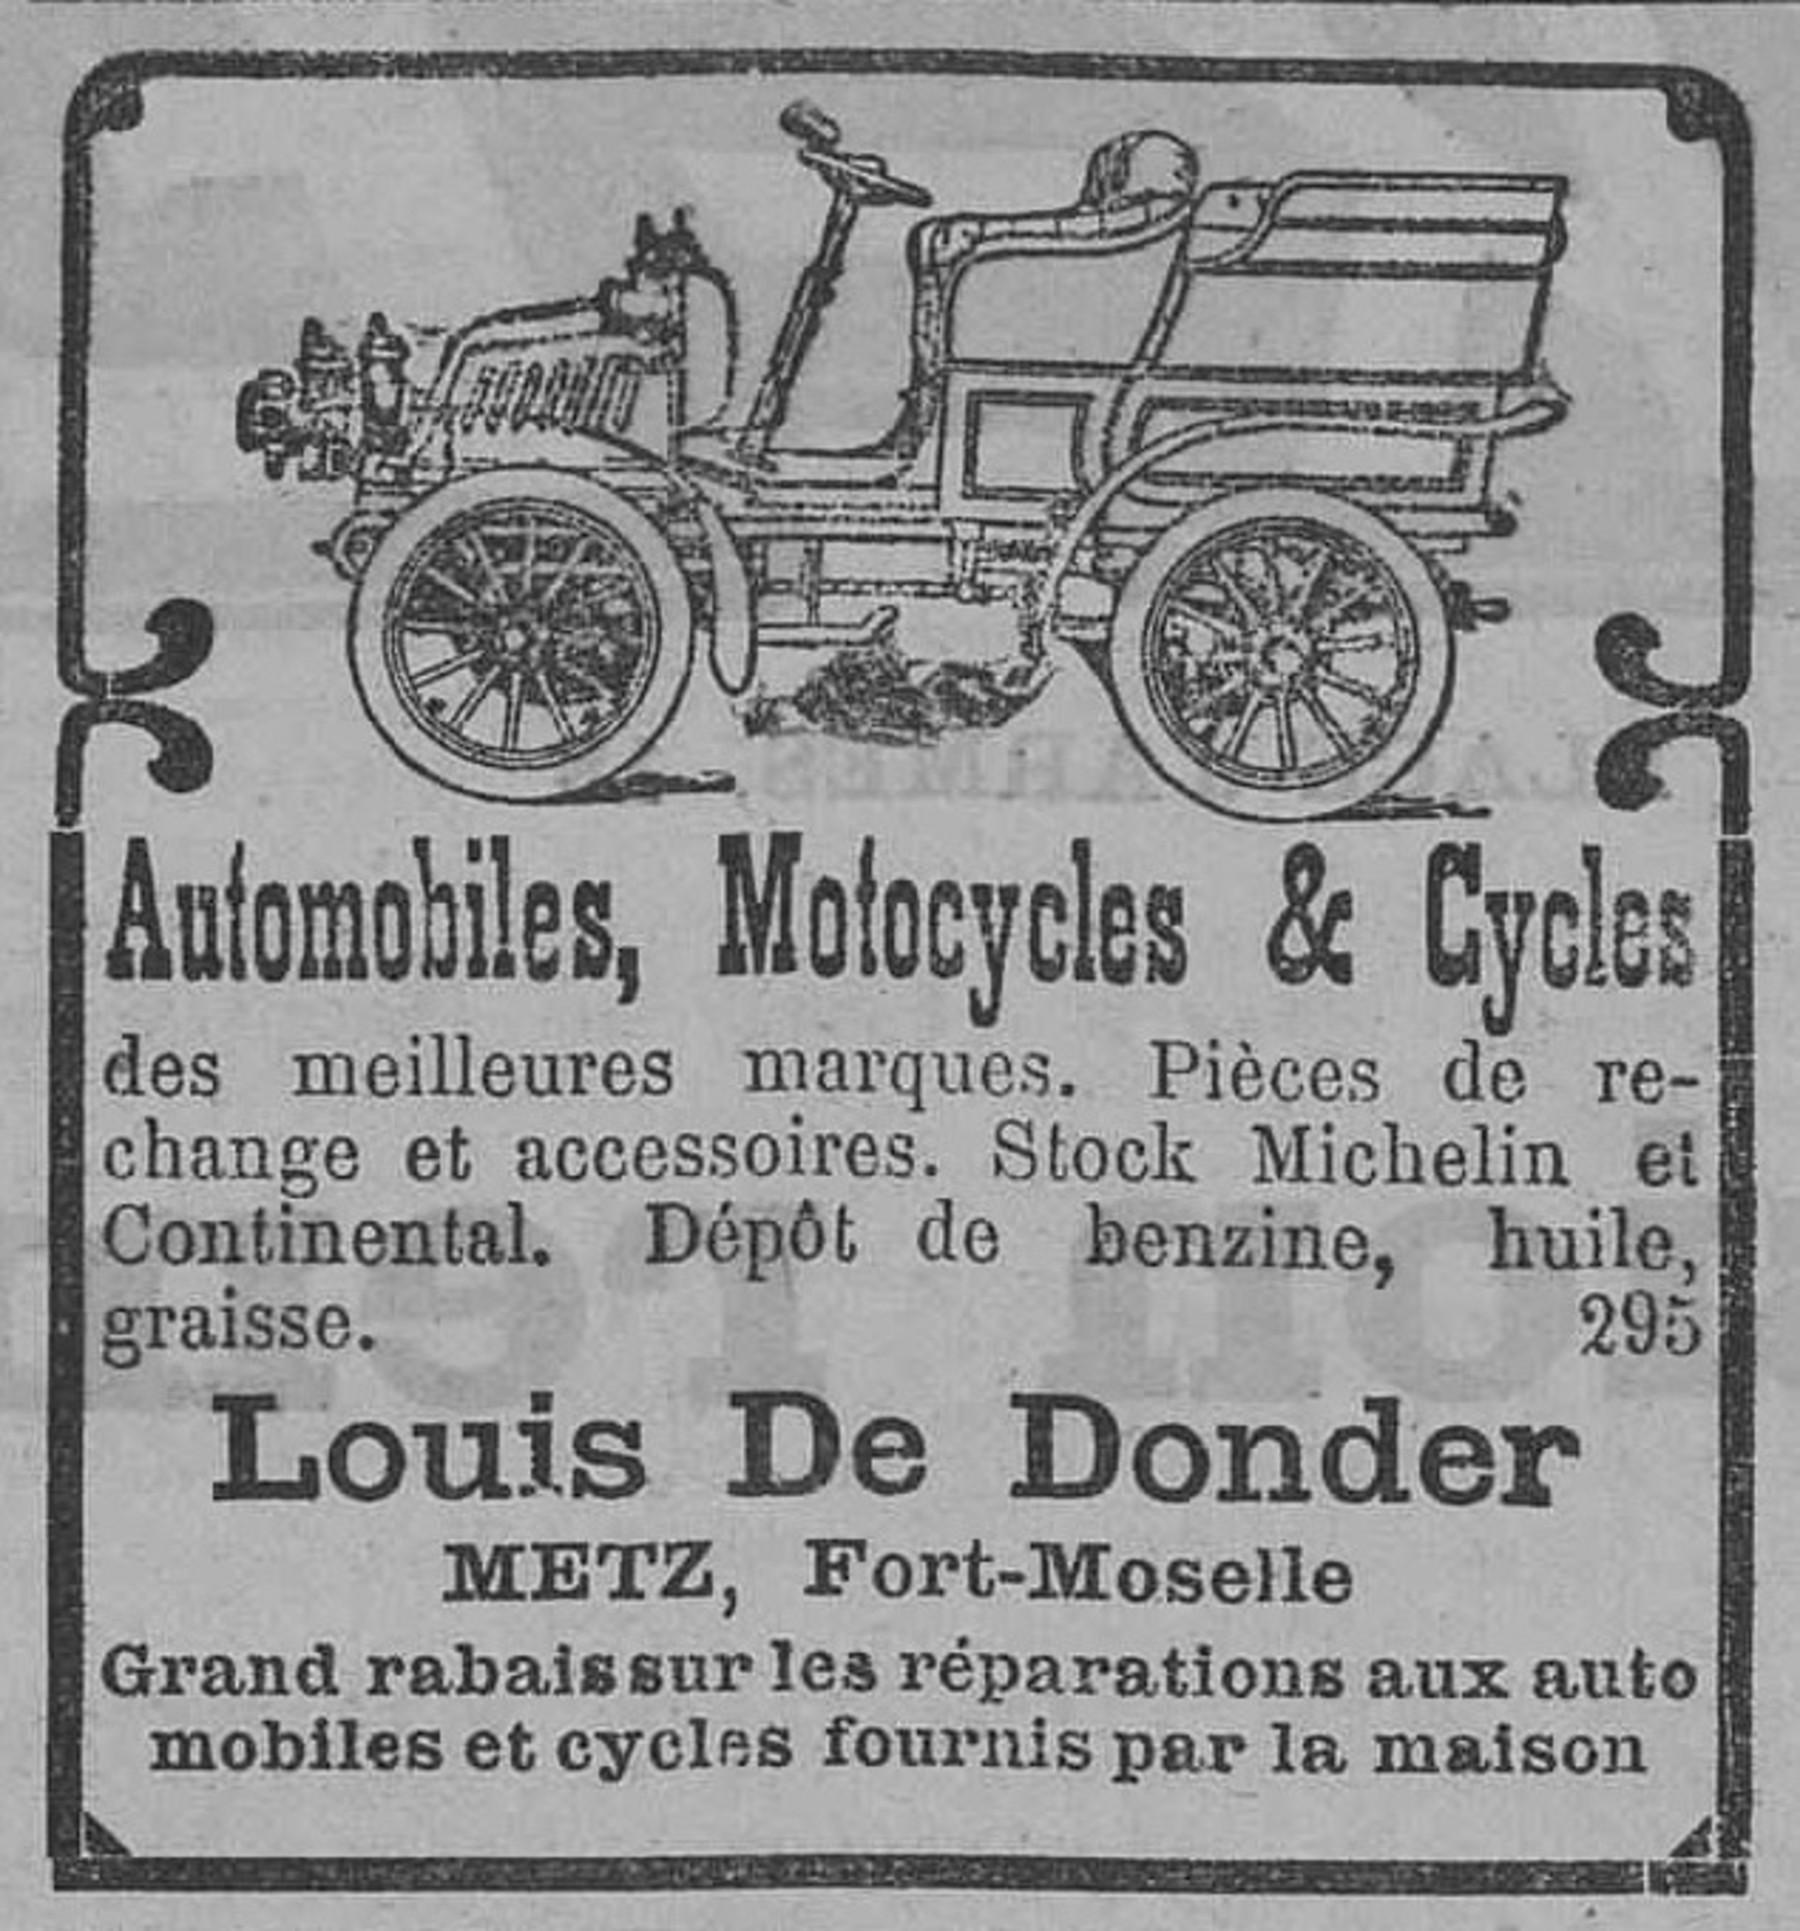 Contenu du Automobiles, motocycles & cycles, Louis de Donder